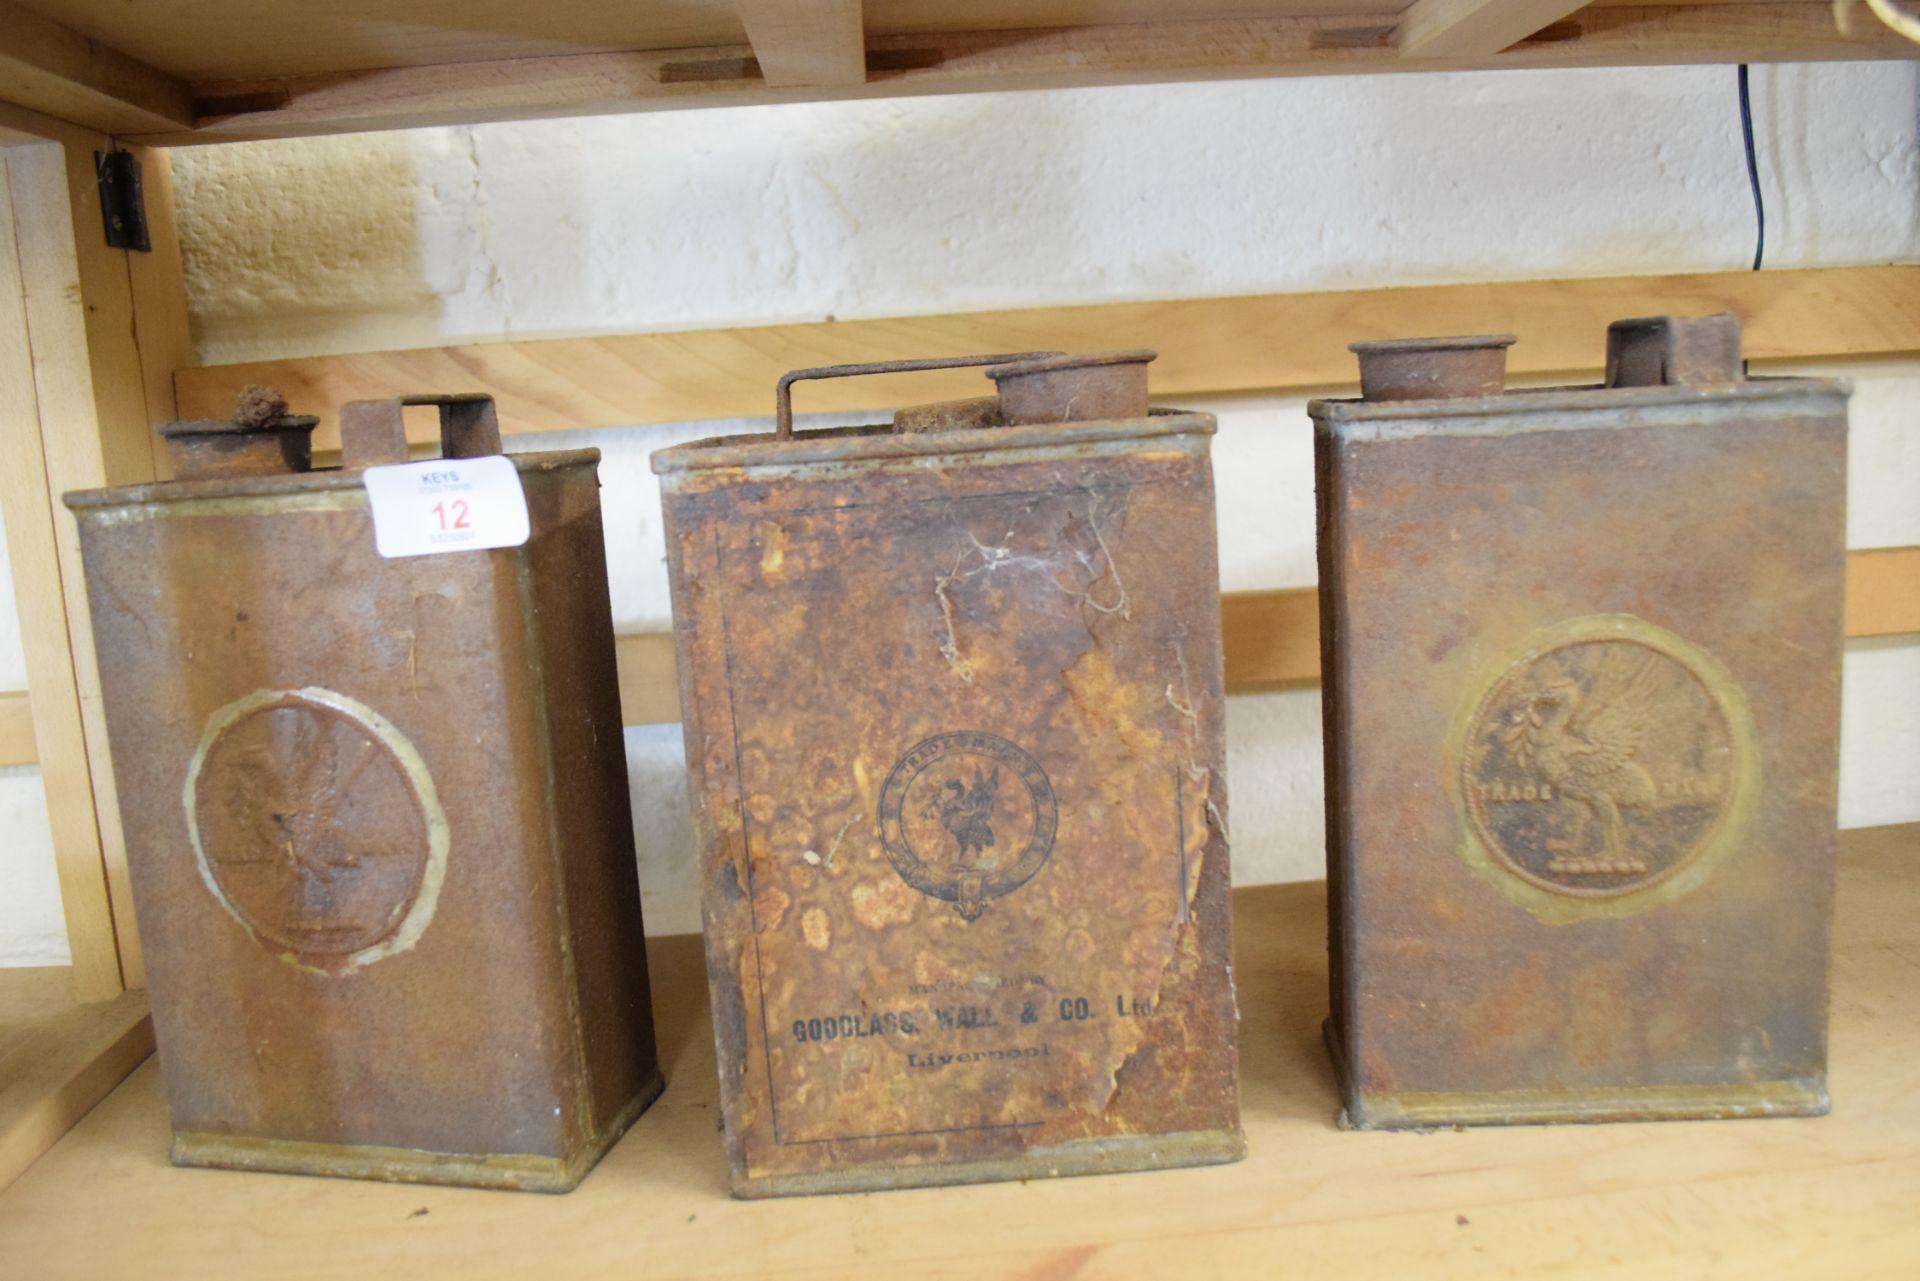 Three vintage Goodlass Wall & Co Ltd Liverpool